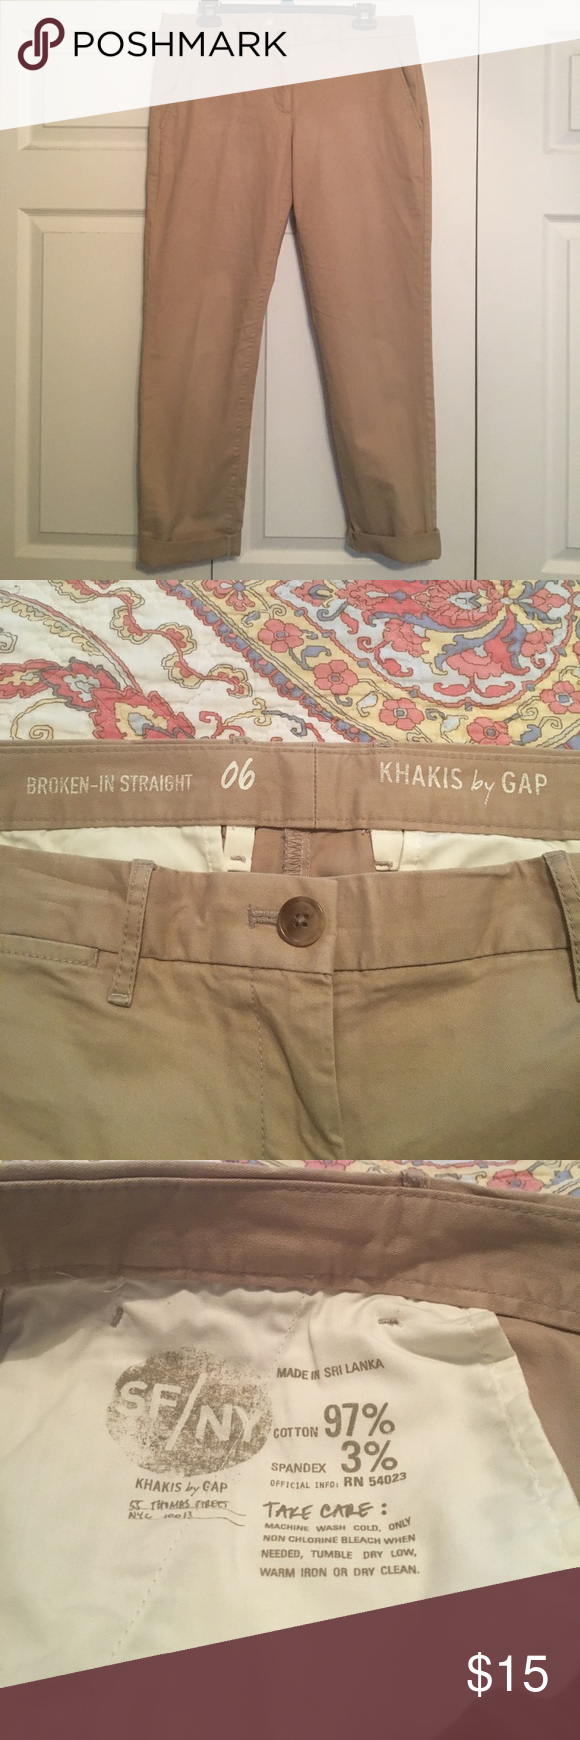 GAP Khakis, Broken-In Straight Size 6, excellent condition GAP Pants Straight Leg